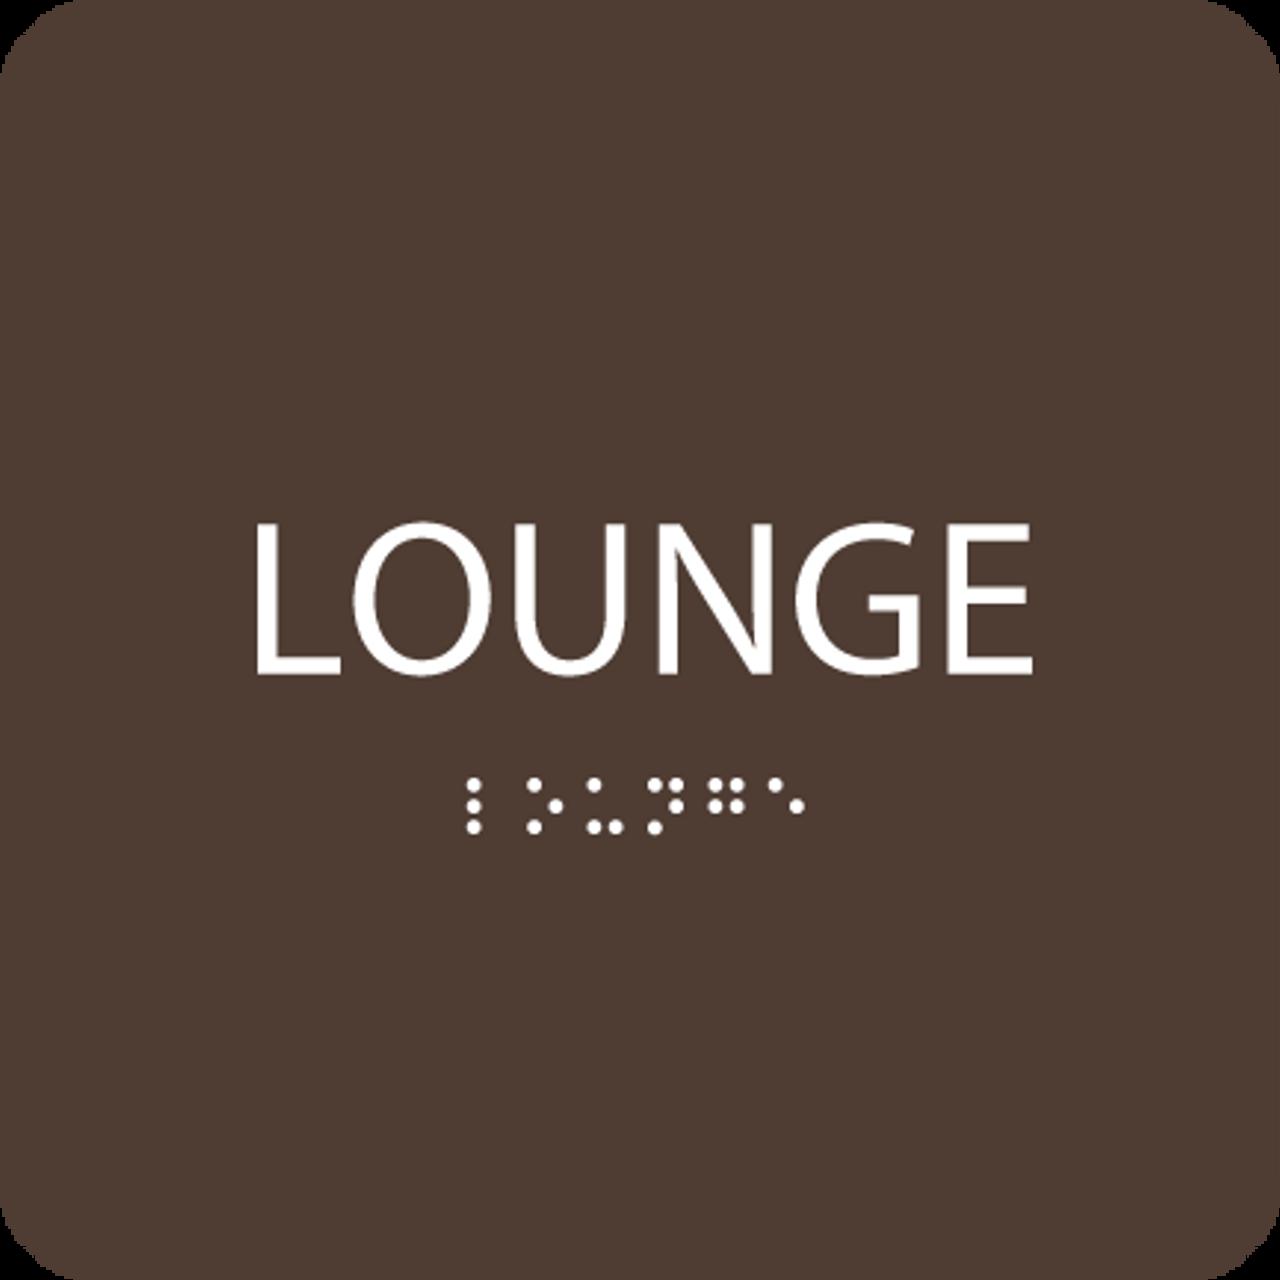 Dark Brown Lounge ADA Sign